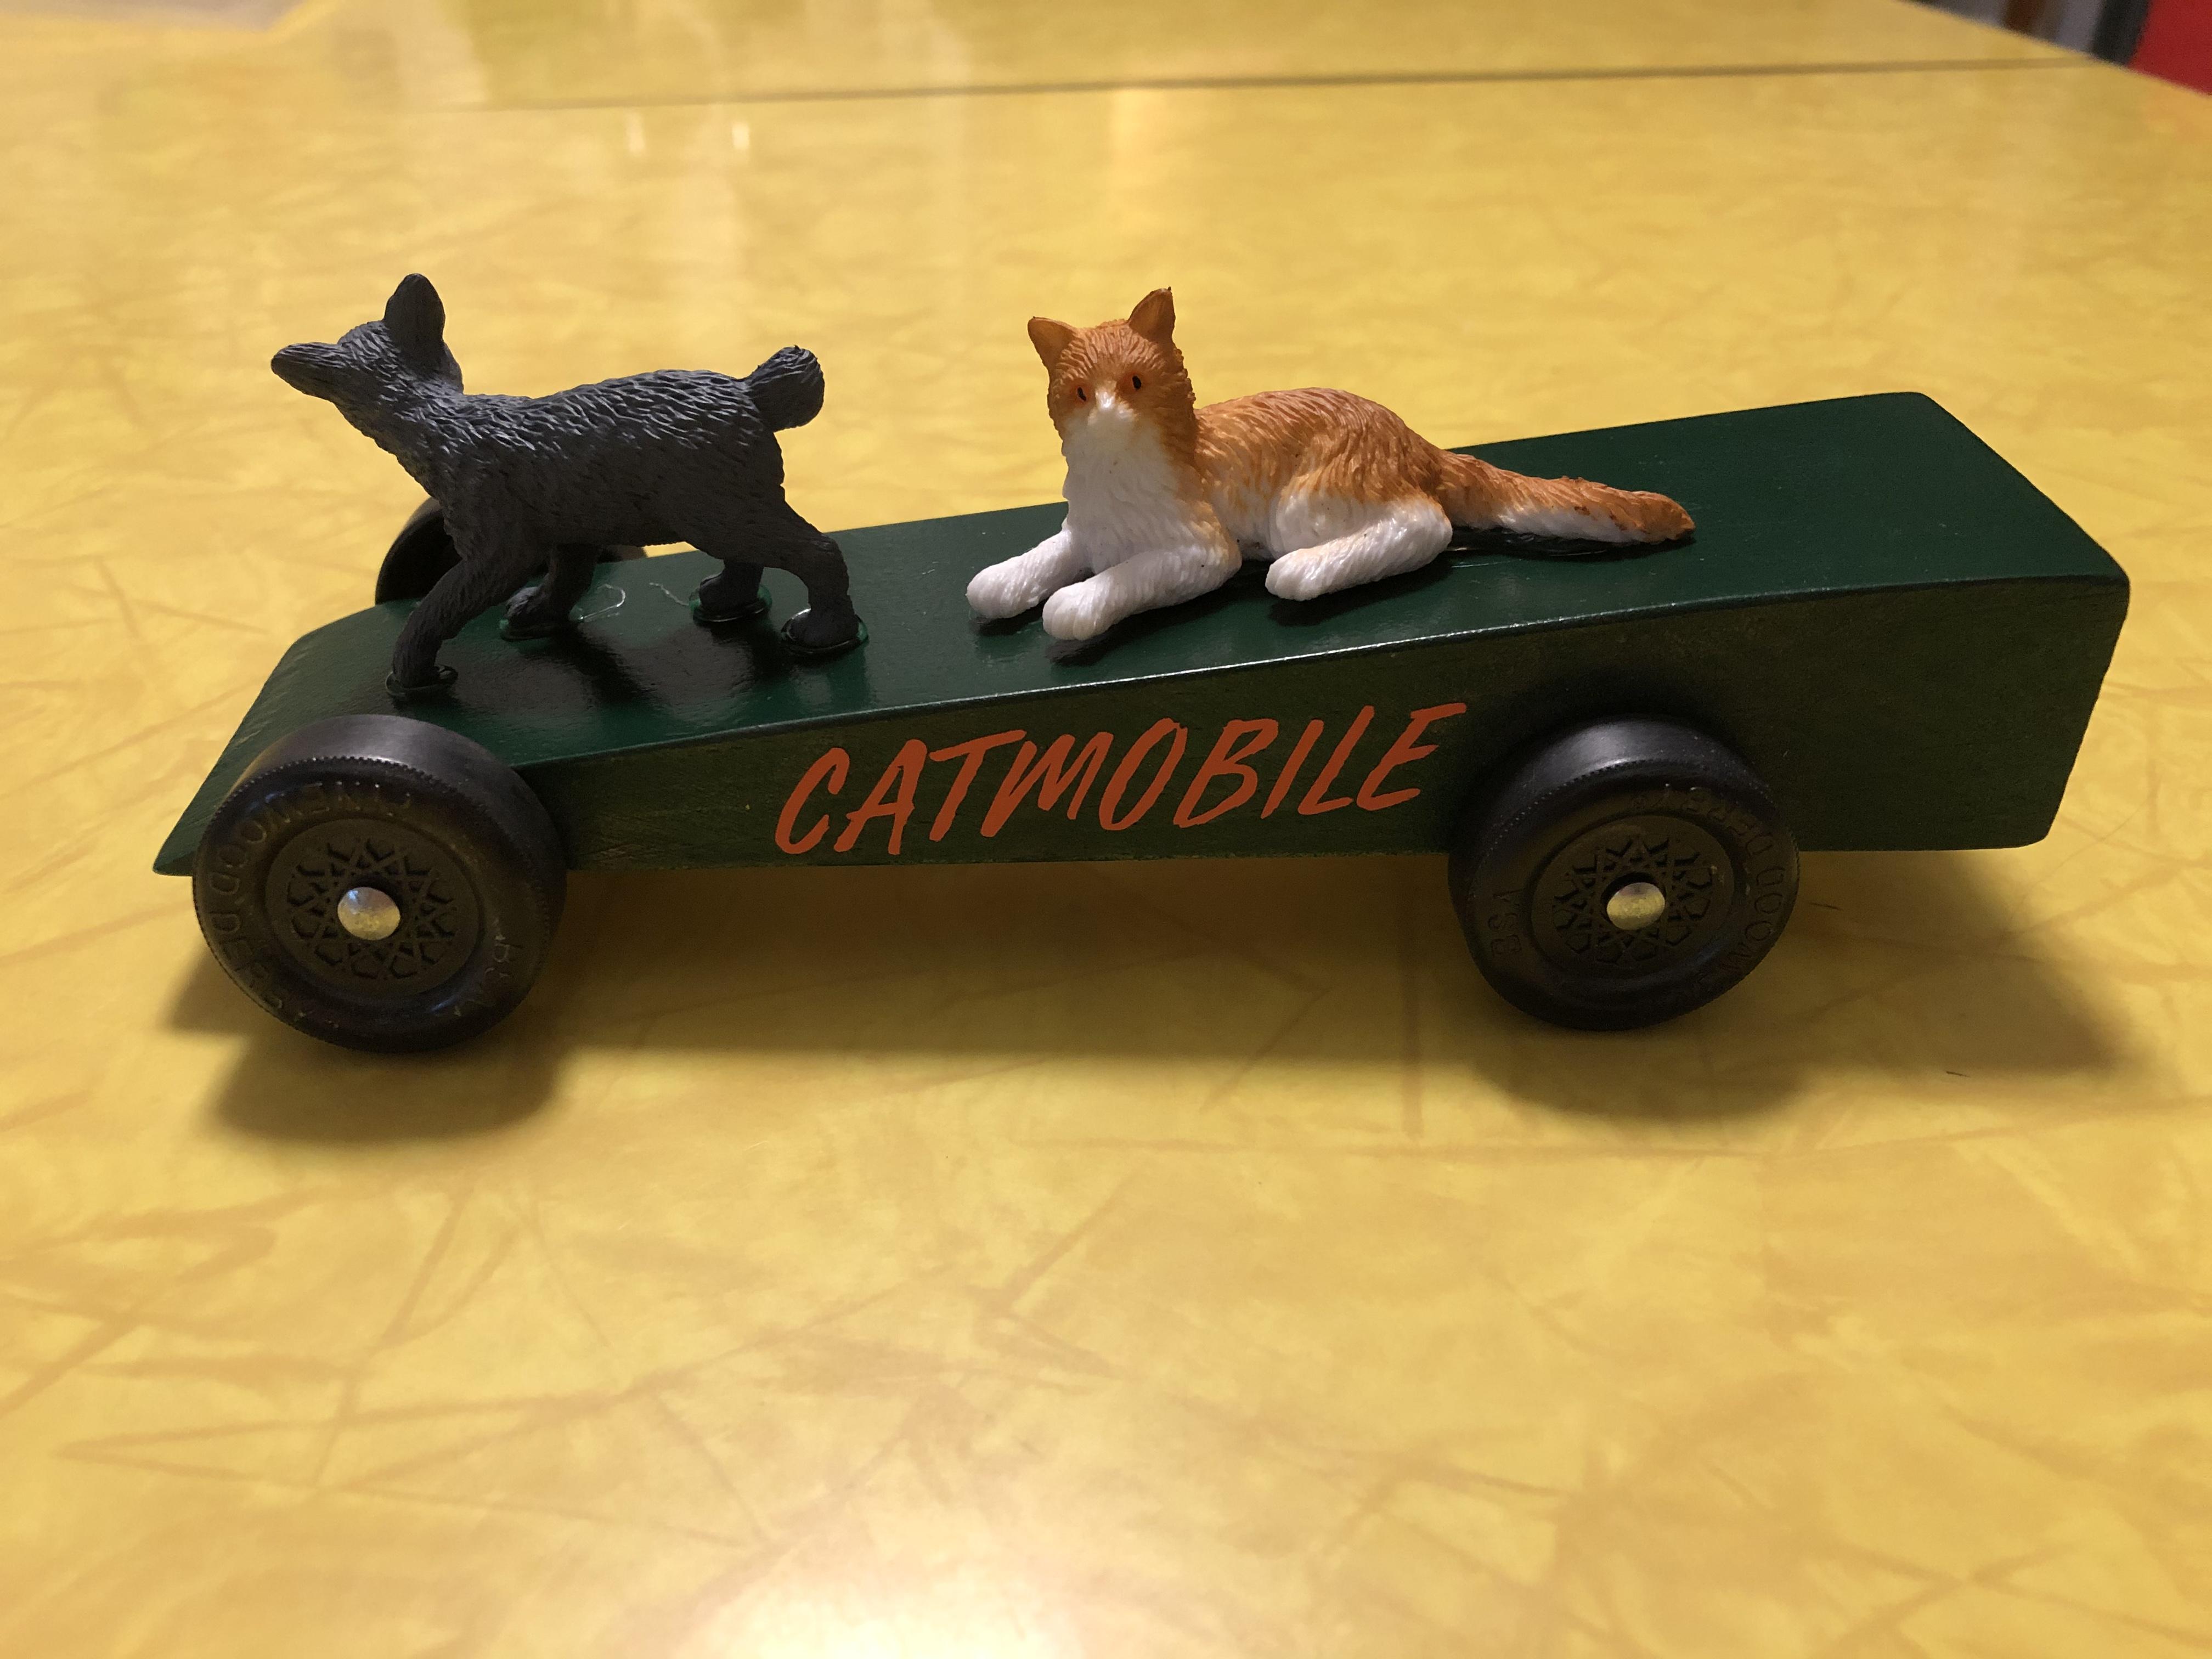 Catmobile